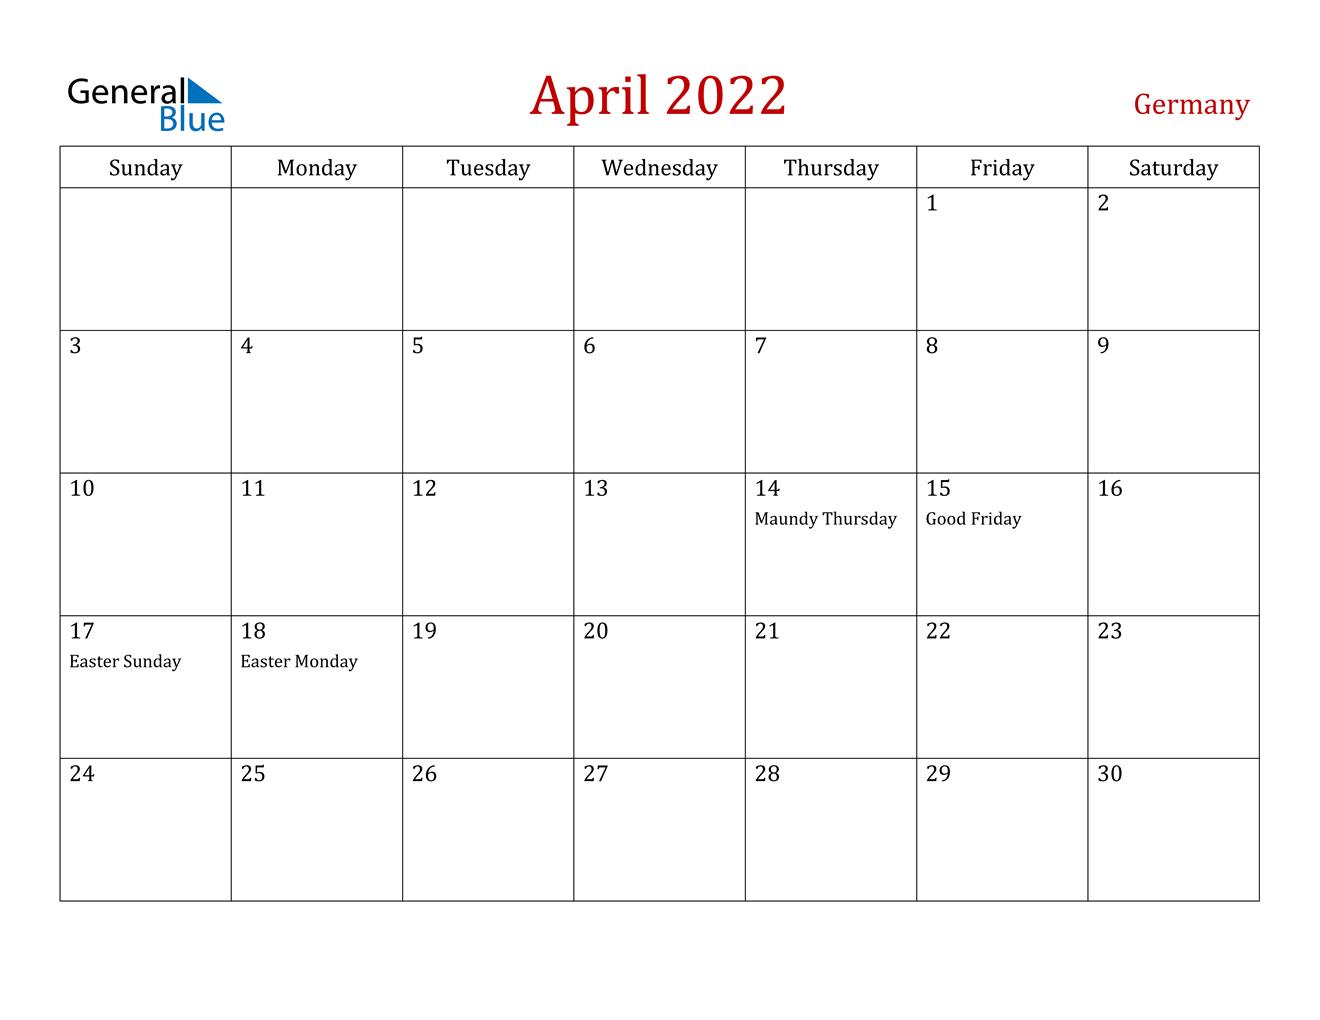 April 2022 Calendar - Germany regarding April May 2022 Printable Calendar